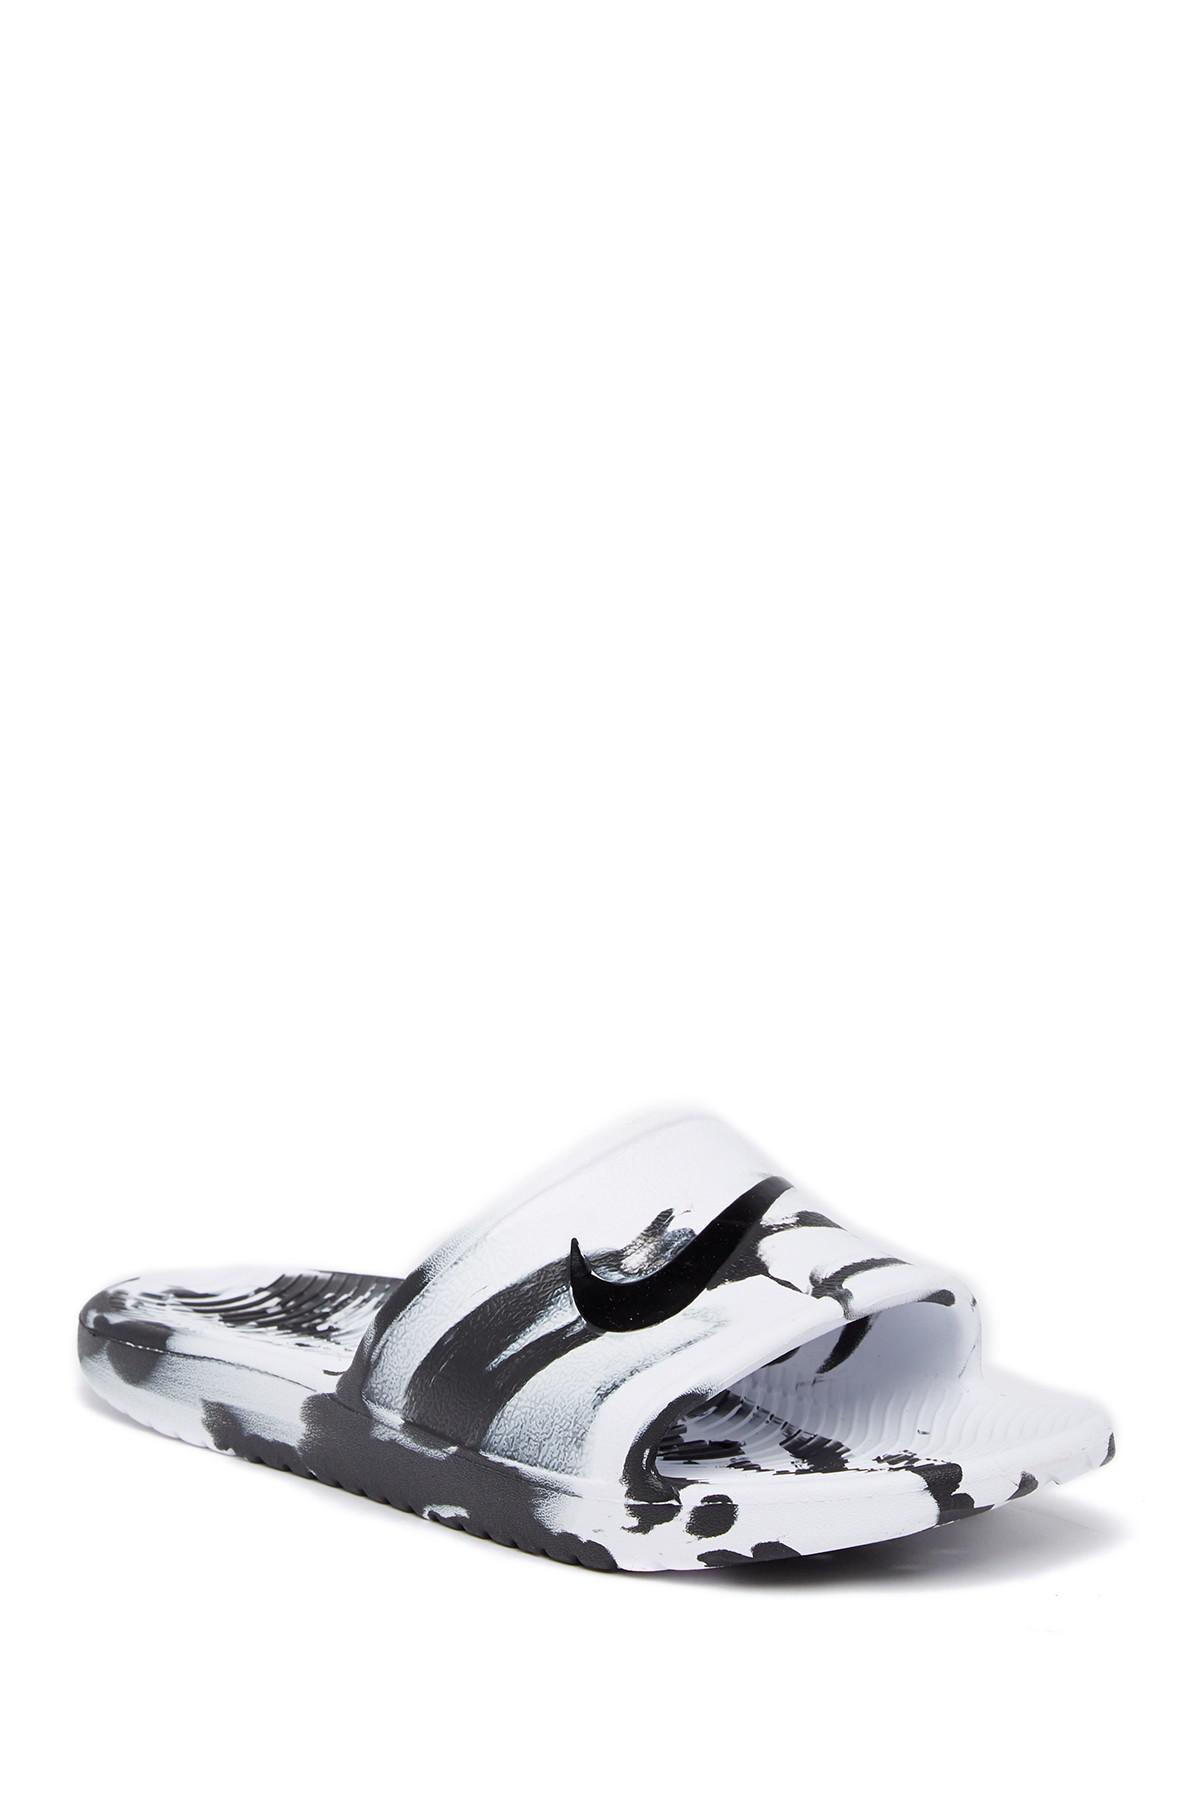 Nike Kawa Shower Marble Slide Sandal in